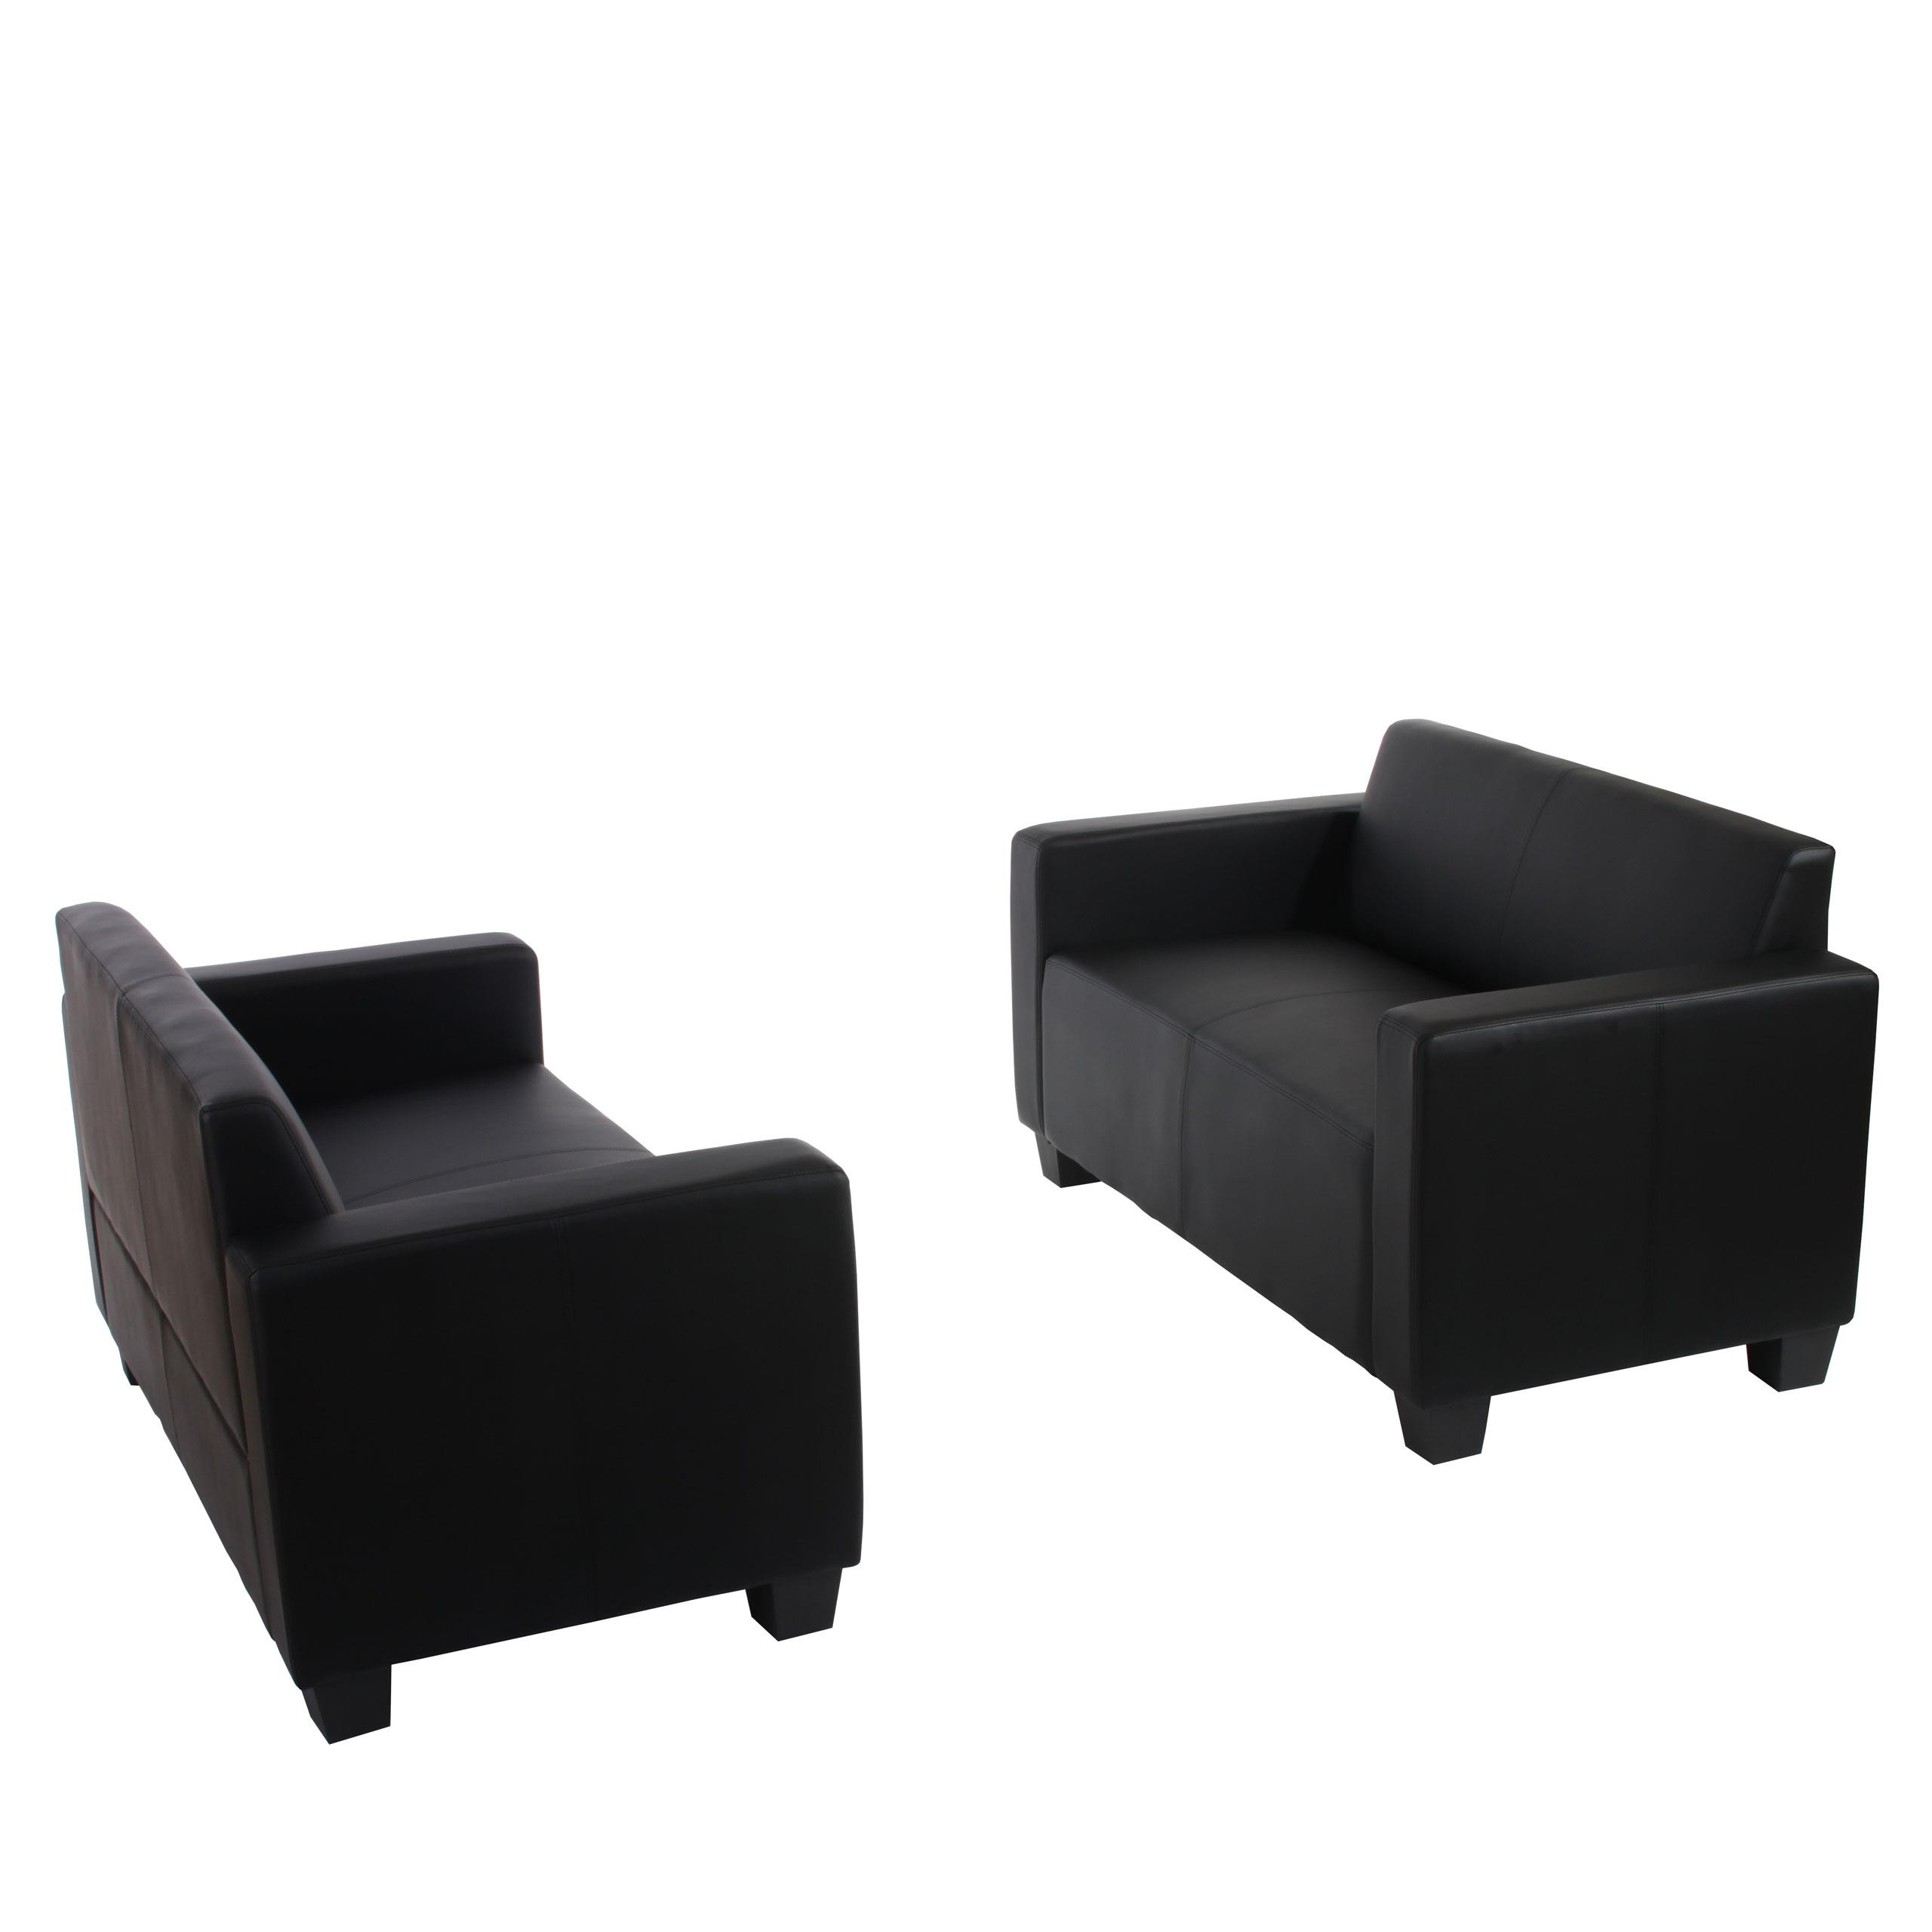 Set due divani a 2 posti RODDY, design moderno e comoda imbottitura ...